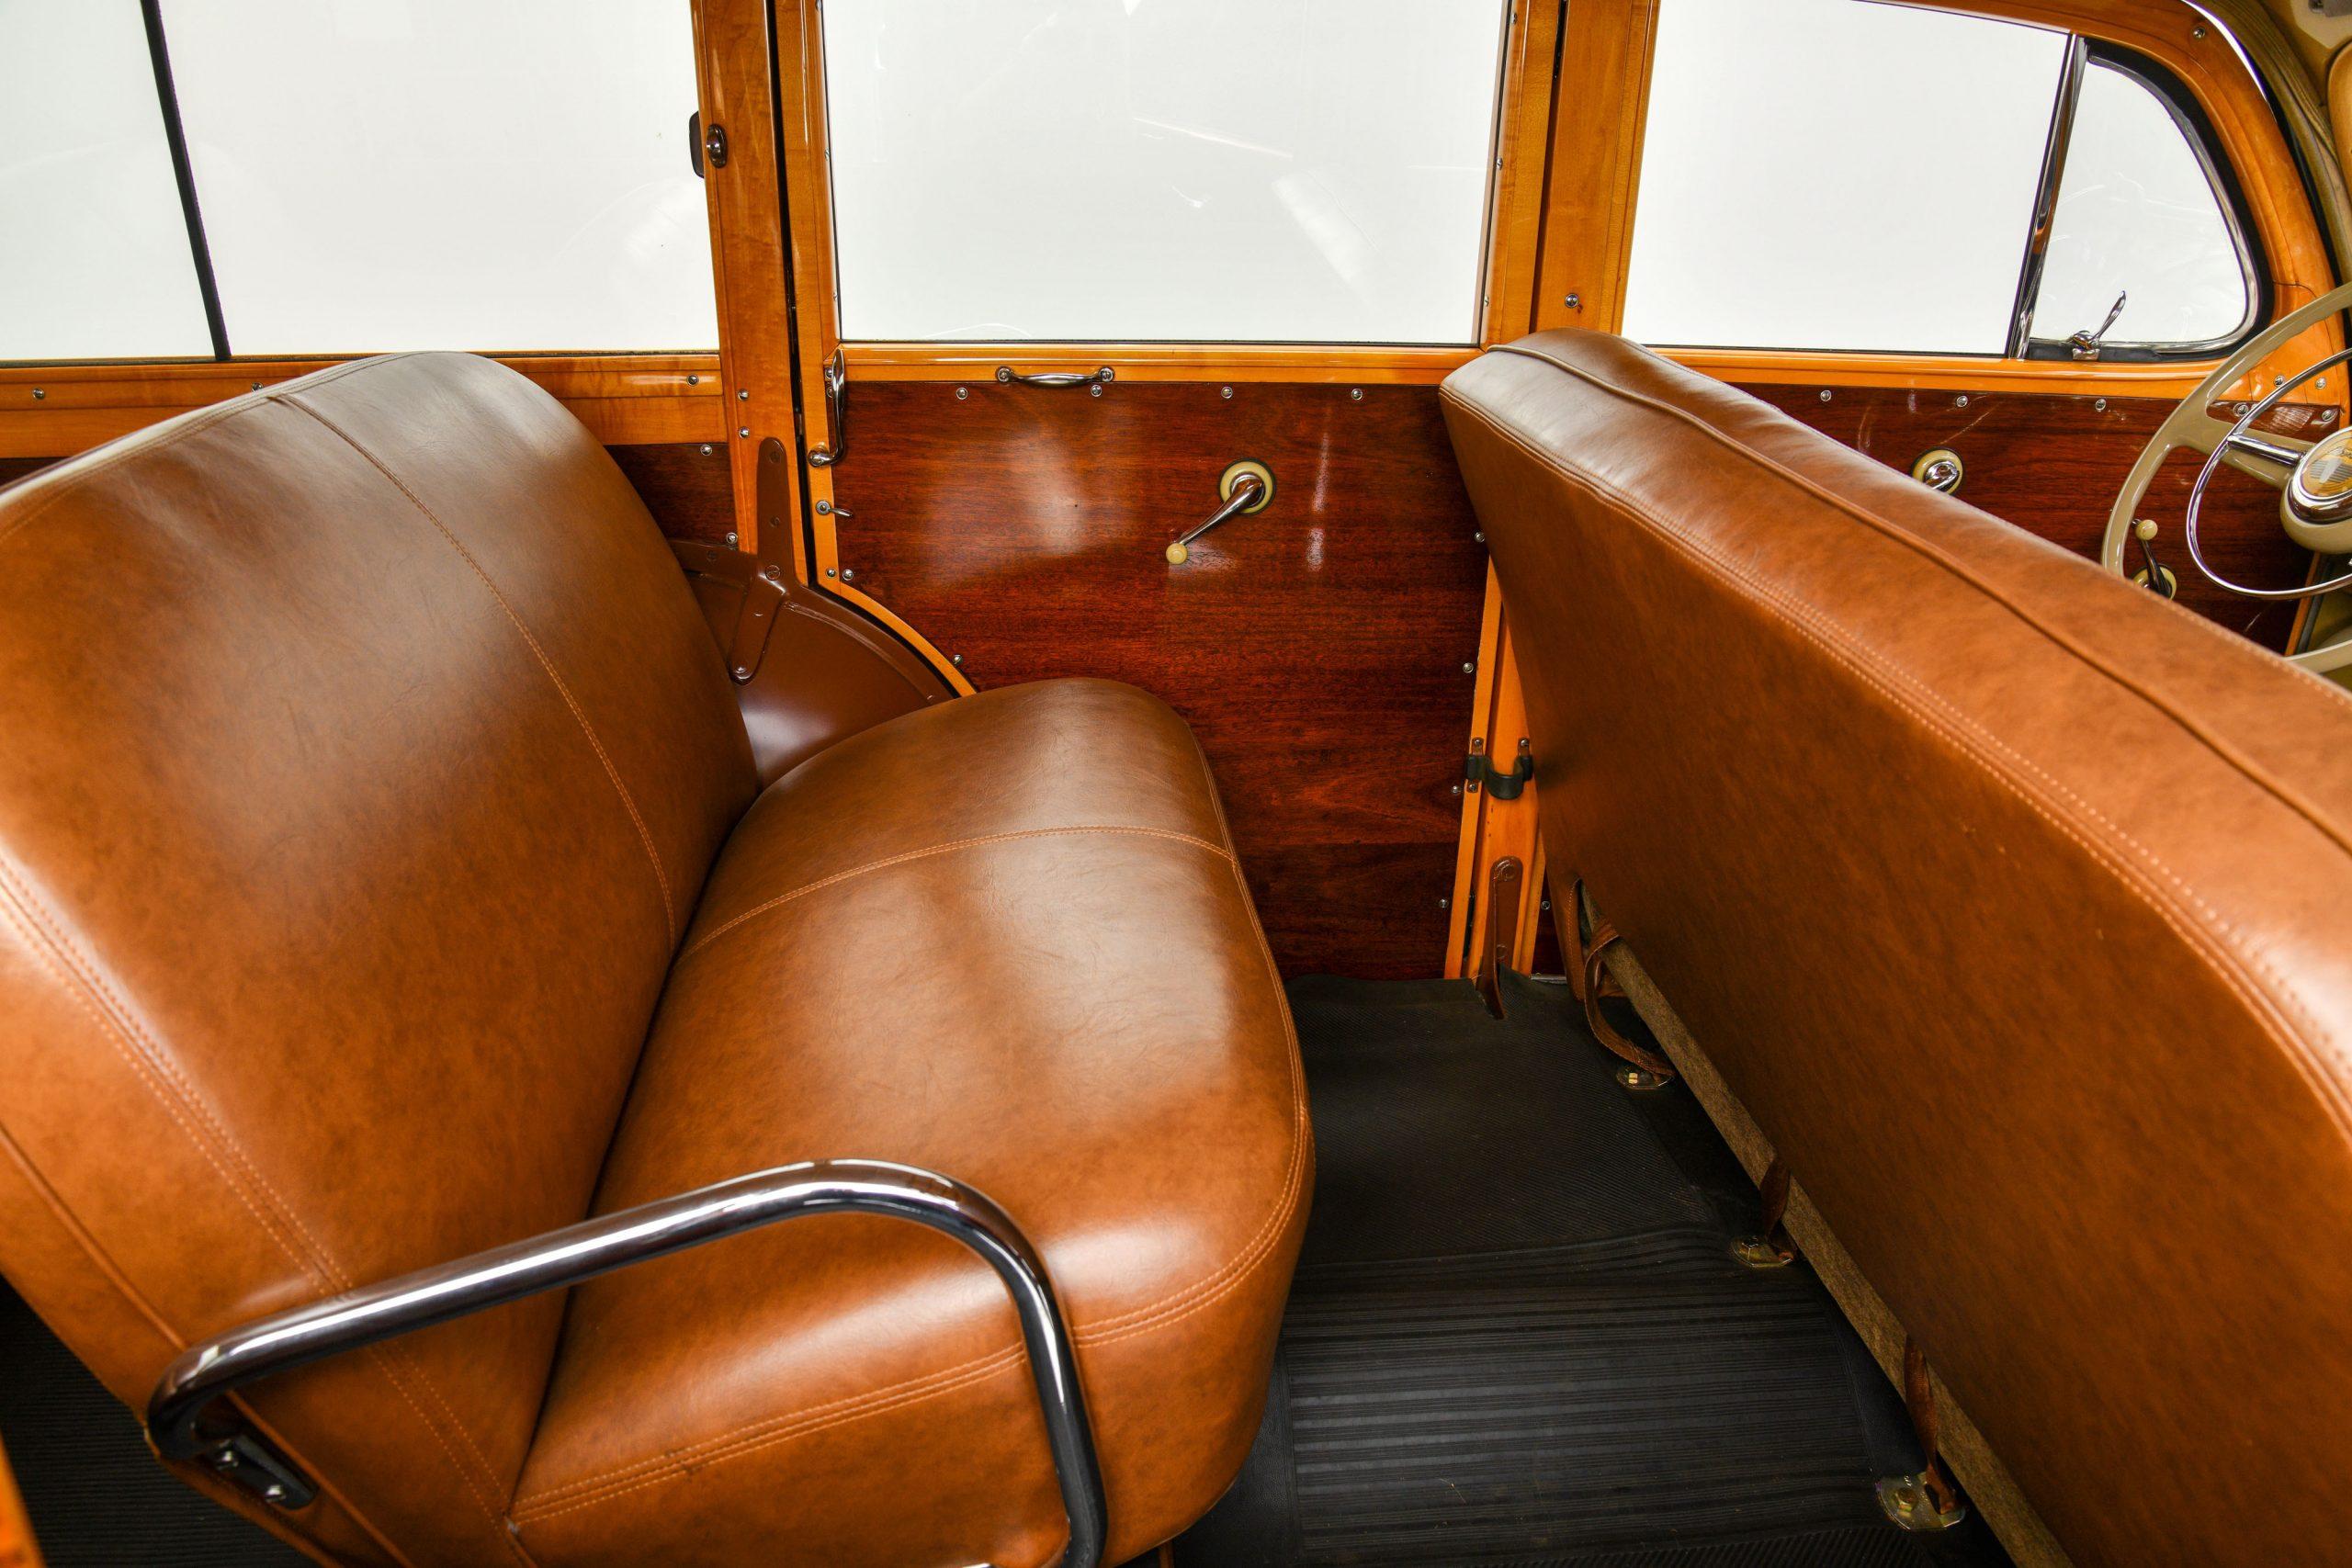 1947 FORD SUPER DELUXE CUSTOM interior rear seat